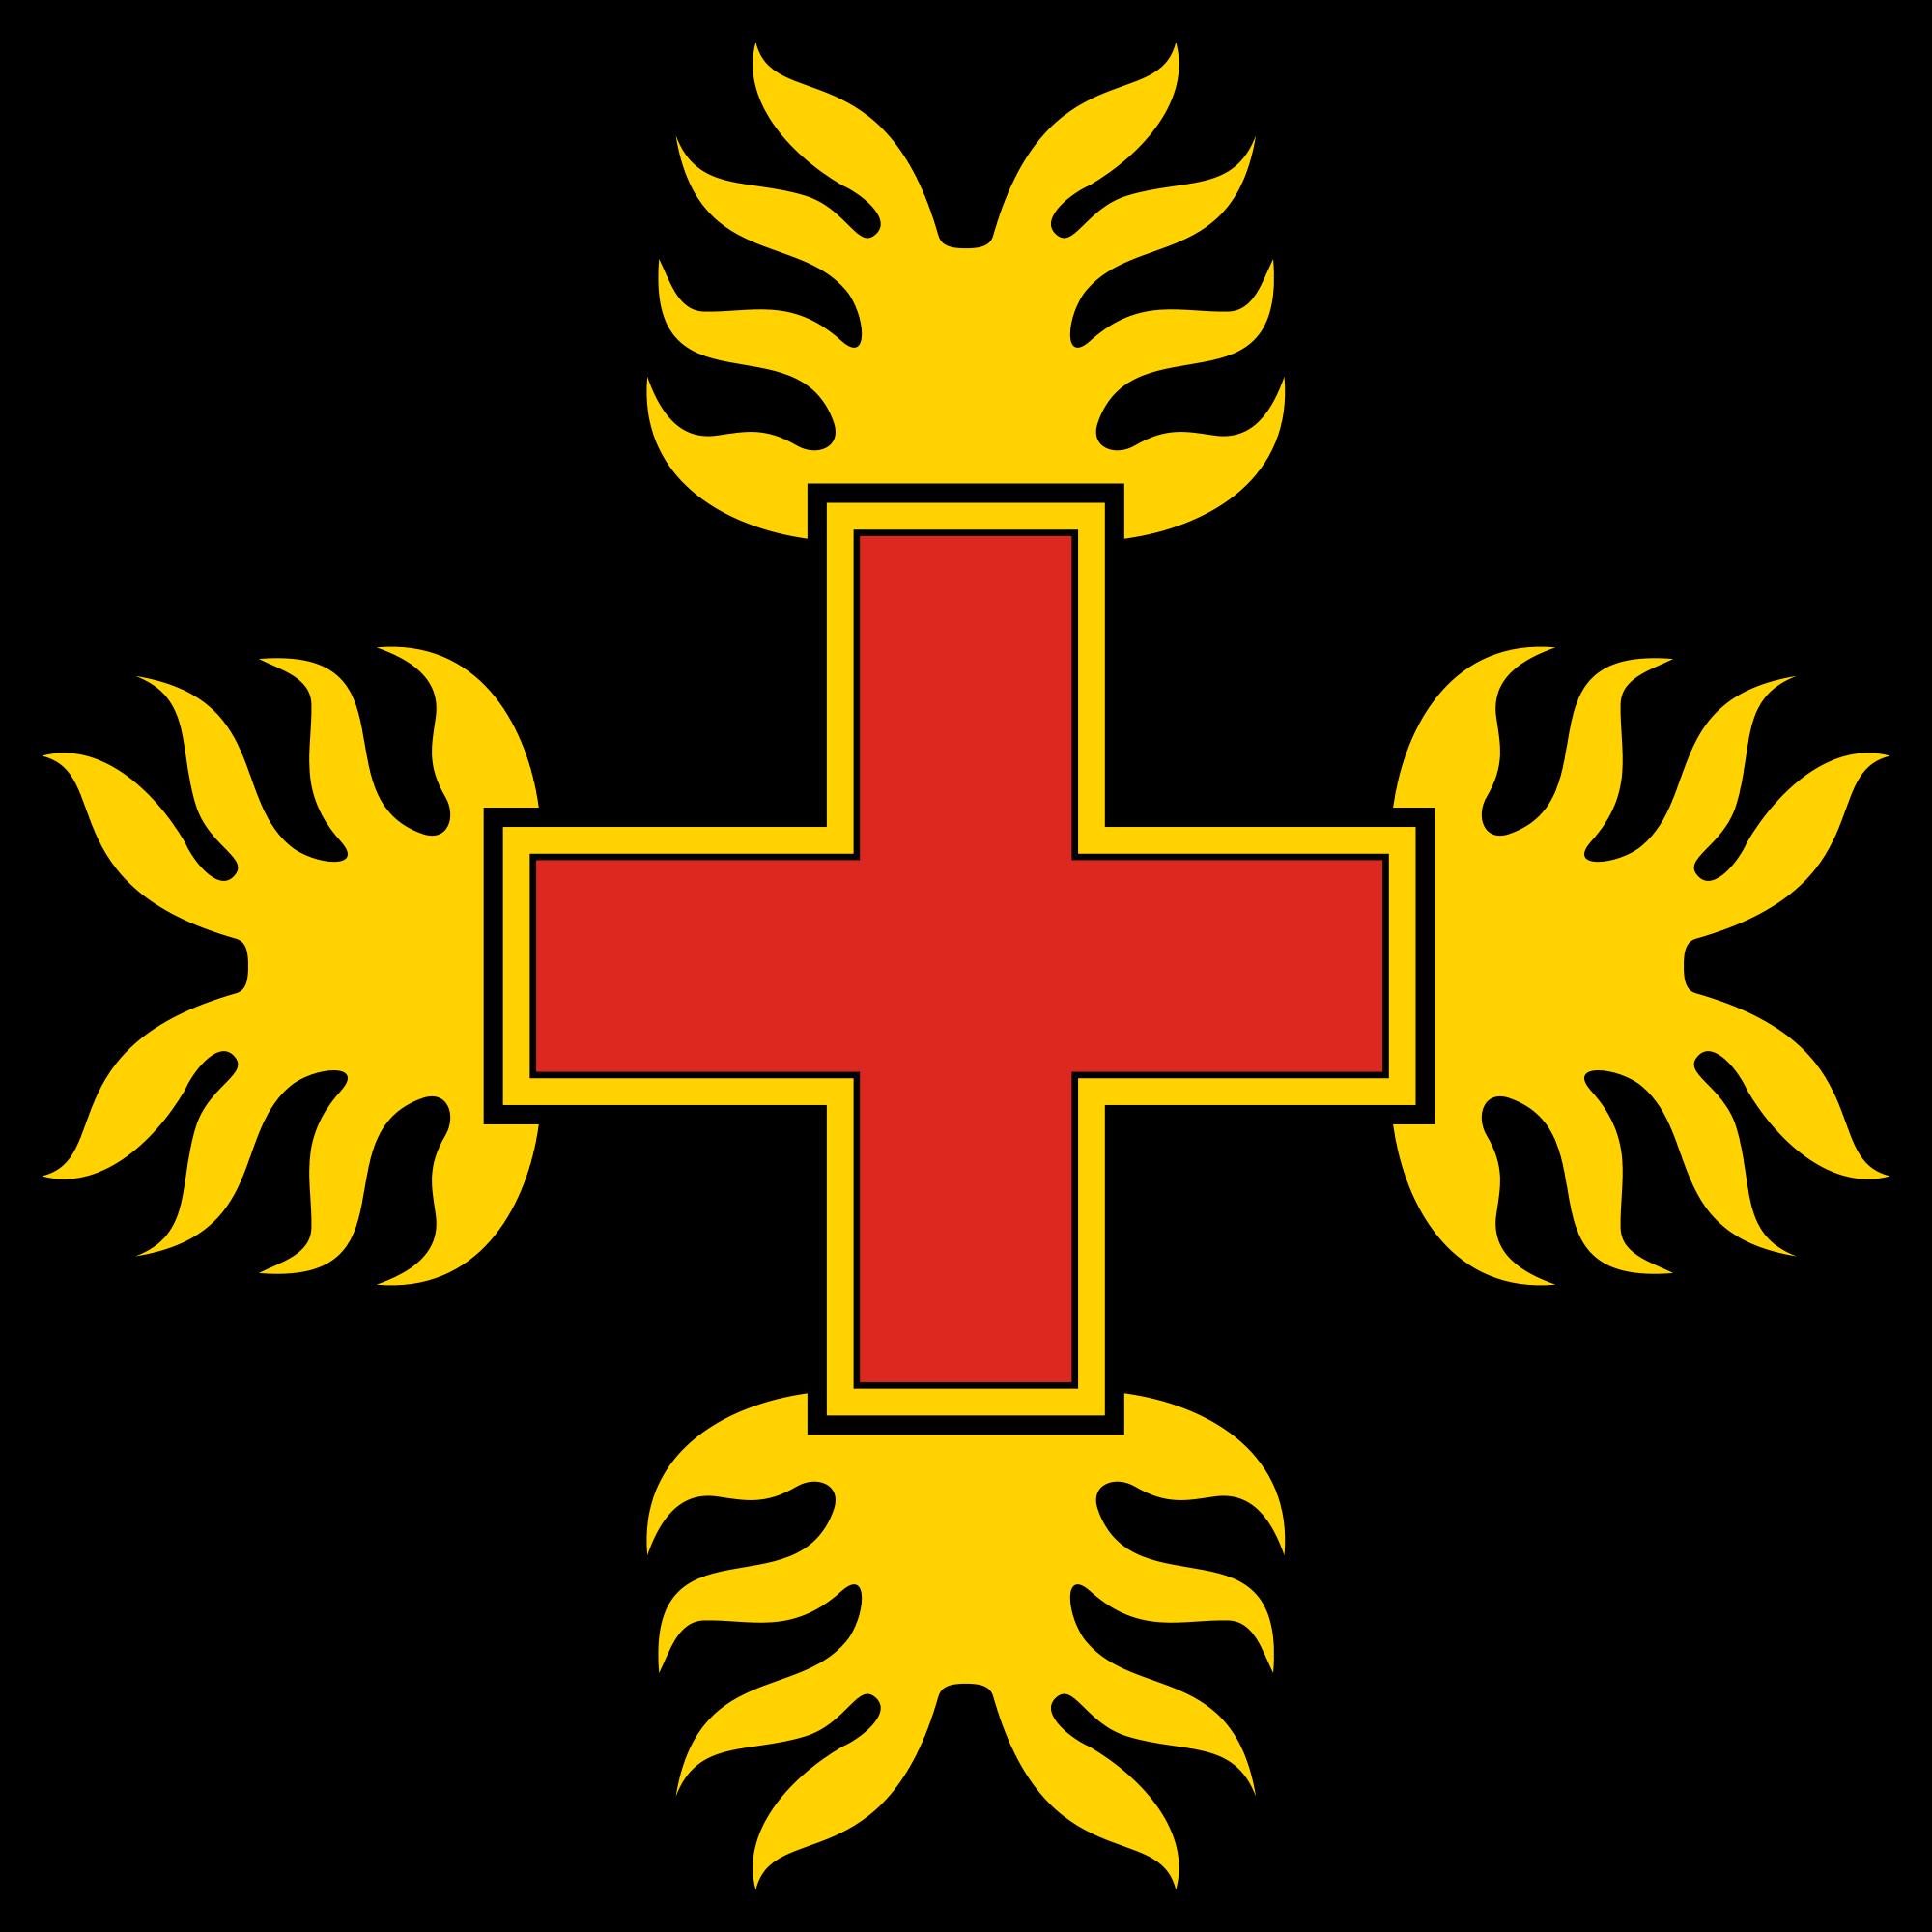 insignia_hungary_order_ordo_draconum_history_svg.png